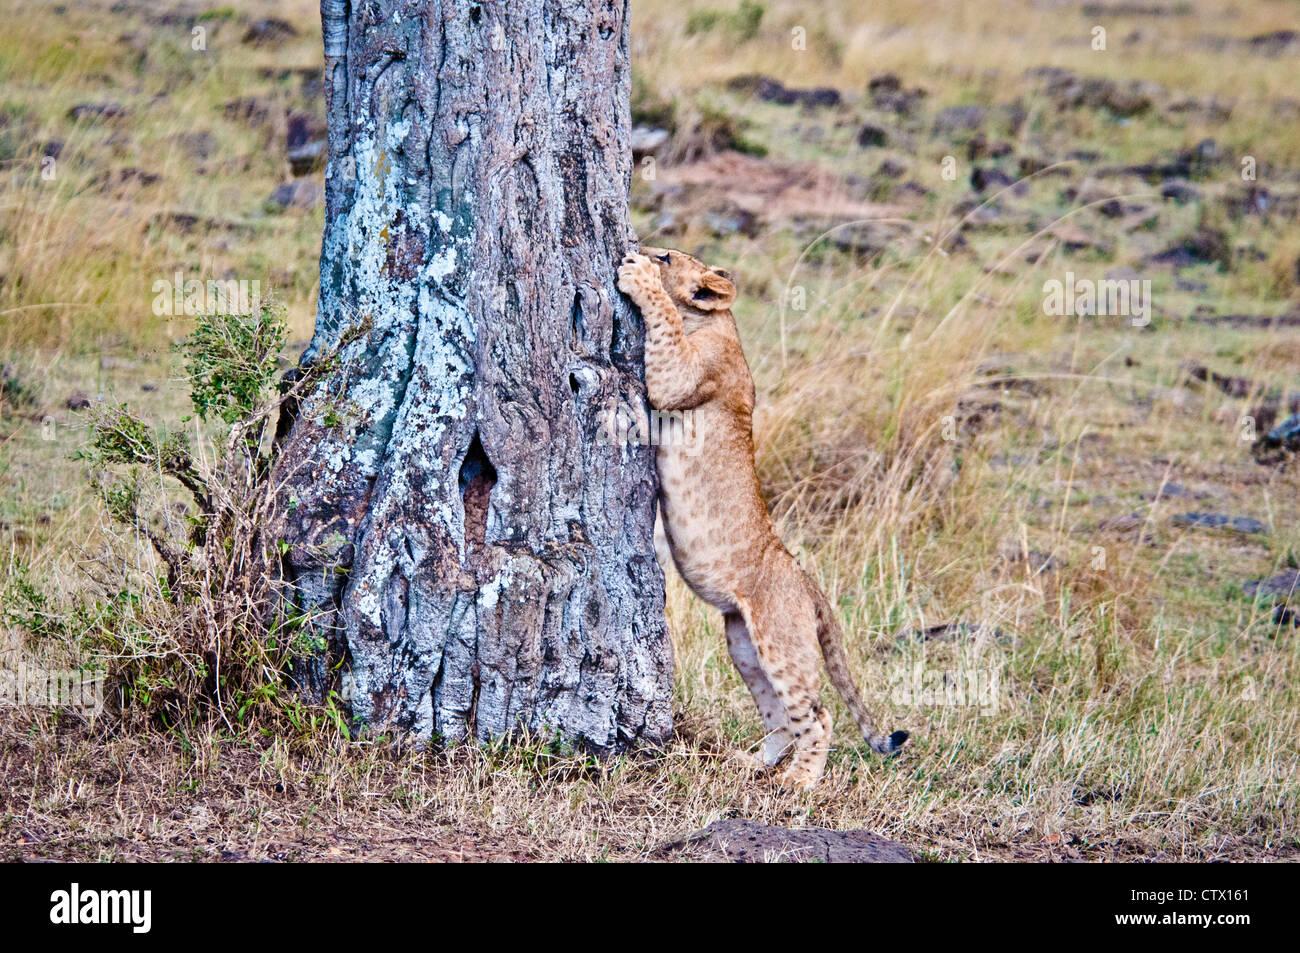 African Lion Cub, Panthera leo, trying to climb a tree, Masai Mara National Reserve, Kenya - Stock Image